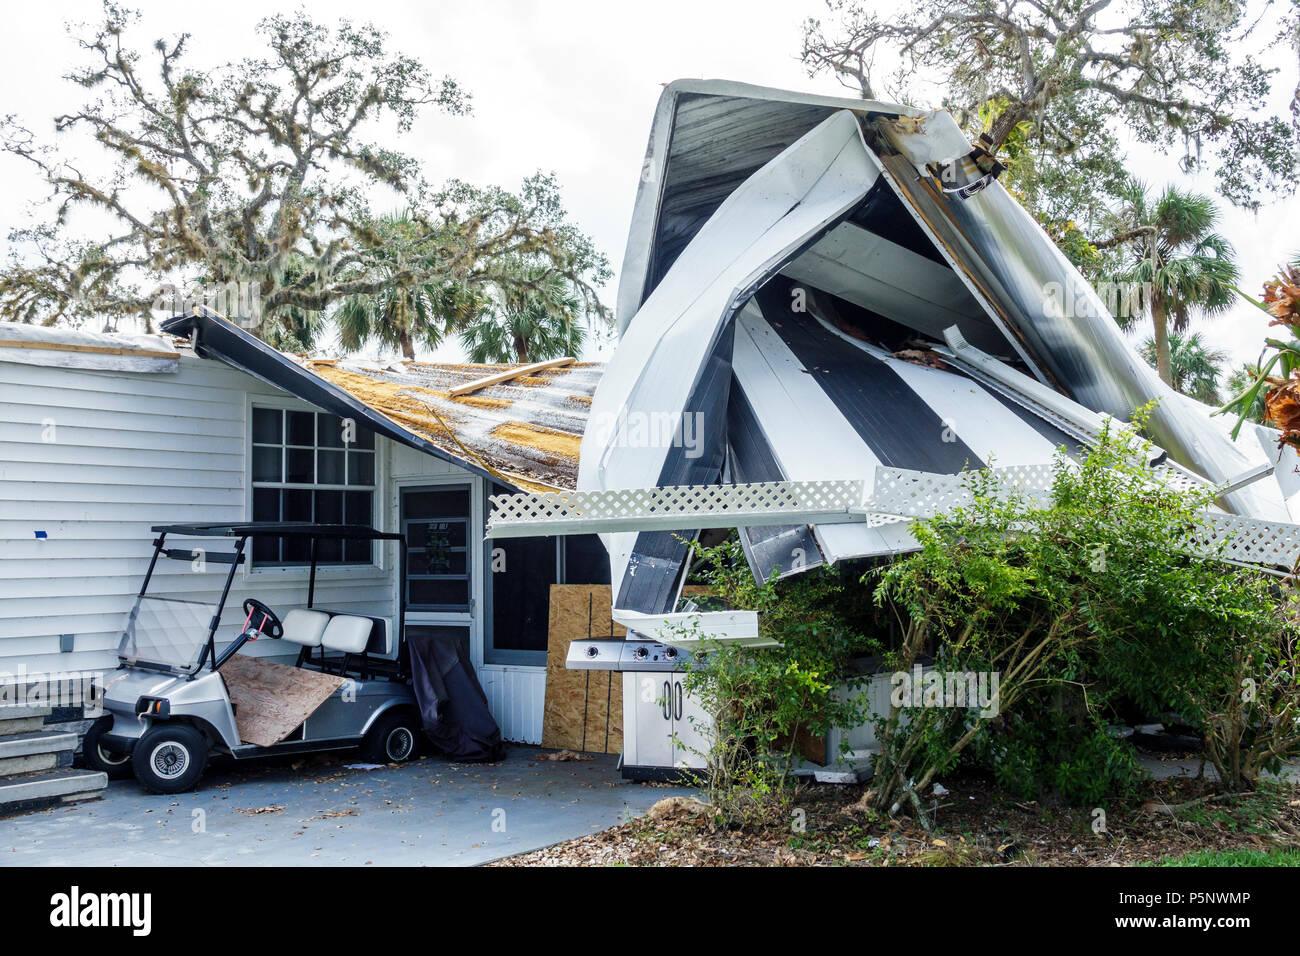 Fort Ft. Myers Florida Alva Oak Park Mobile Home Village after Hurricane Irma storm wind damage destruction aftermath structural damage aluminum sidin - Stock Image